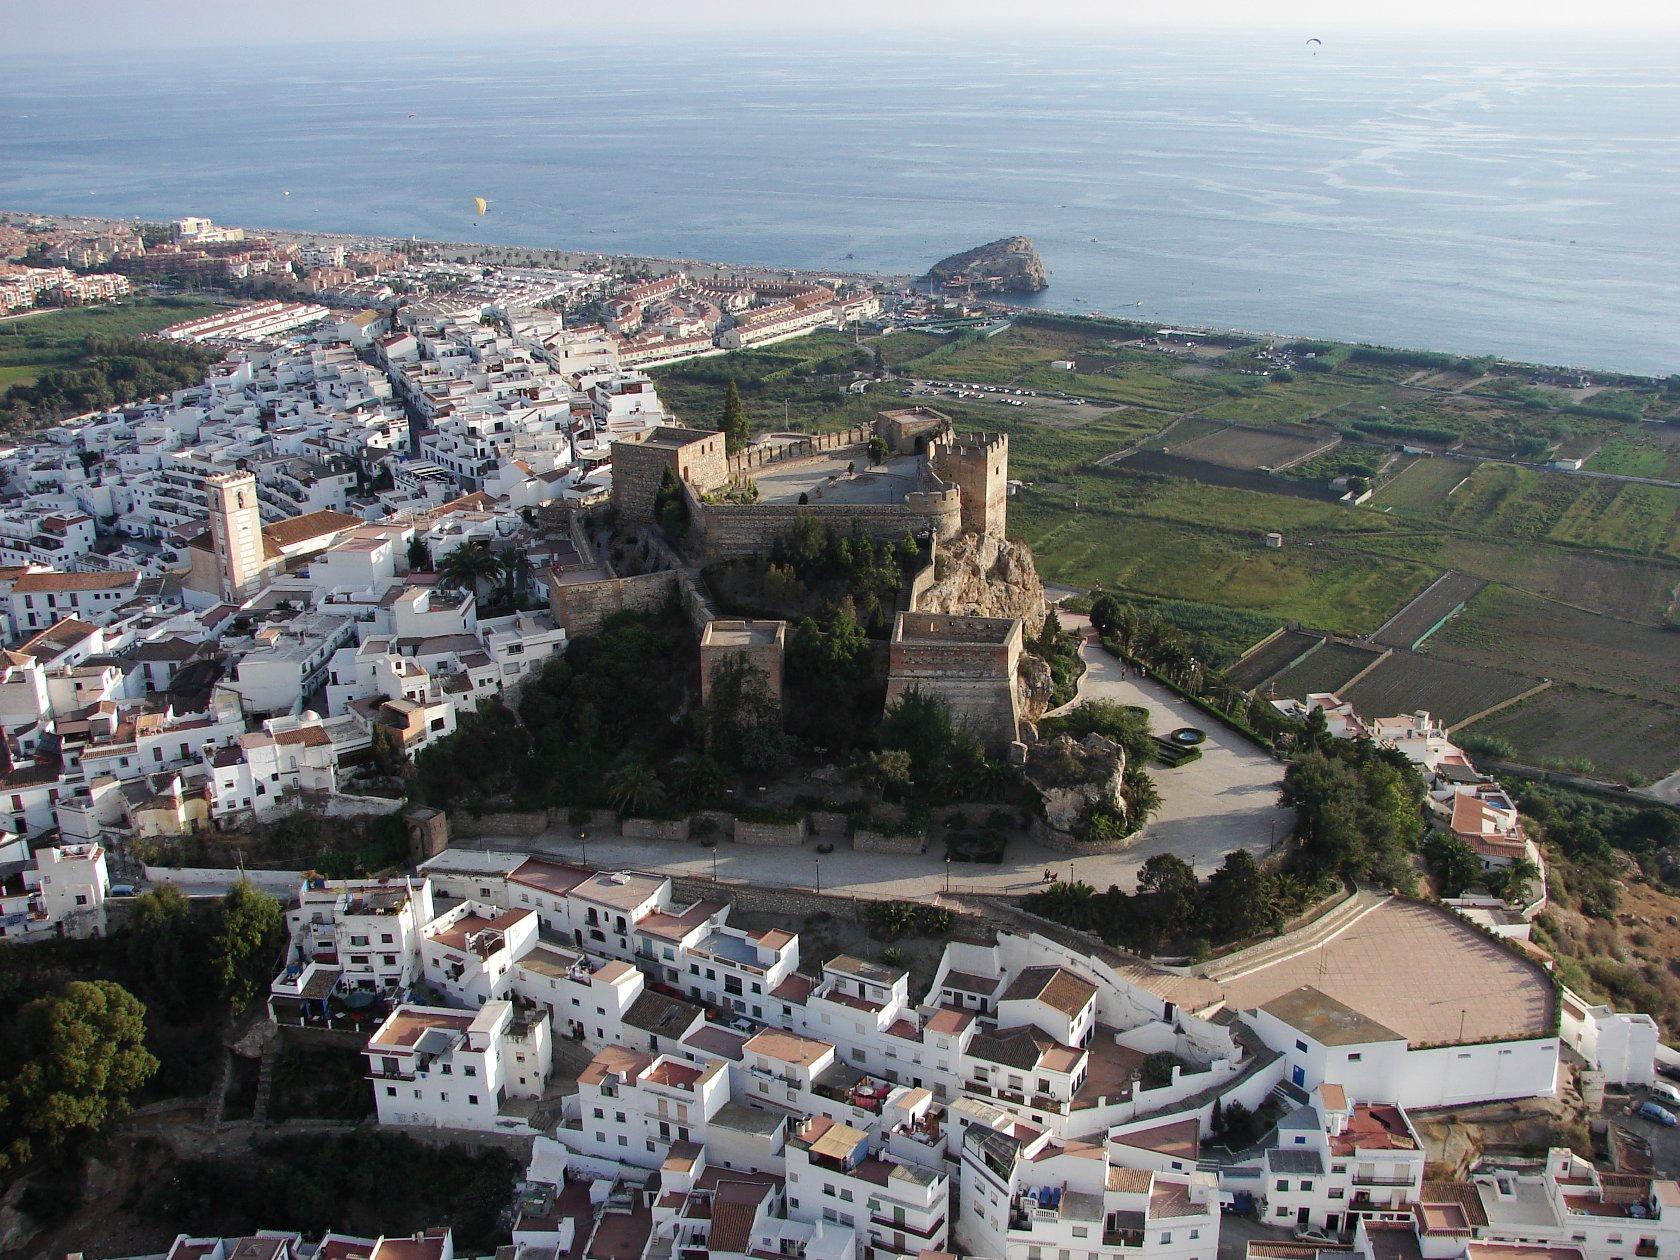 castillo de motril transfer to motril from malaga airport